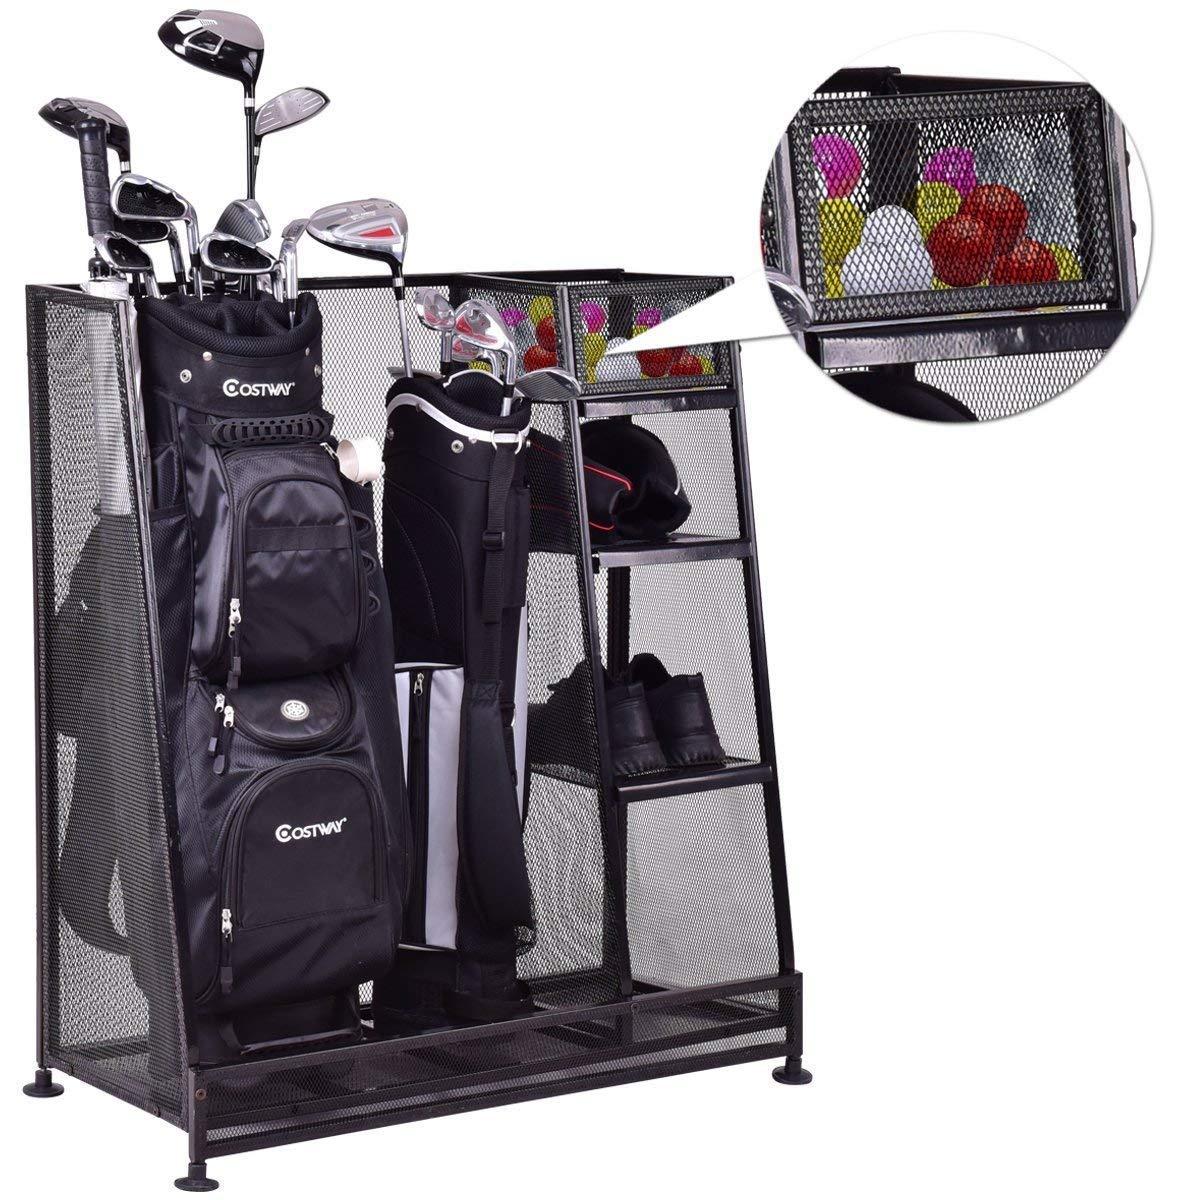 Tangkula Golf Organizer Durable Metal Storage Rack Golf Club Bag and Sports Equipment Organizer by Tangkula